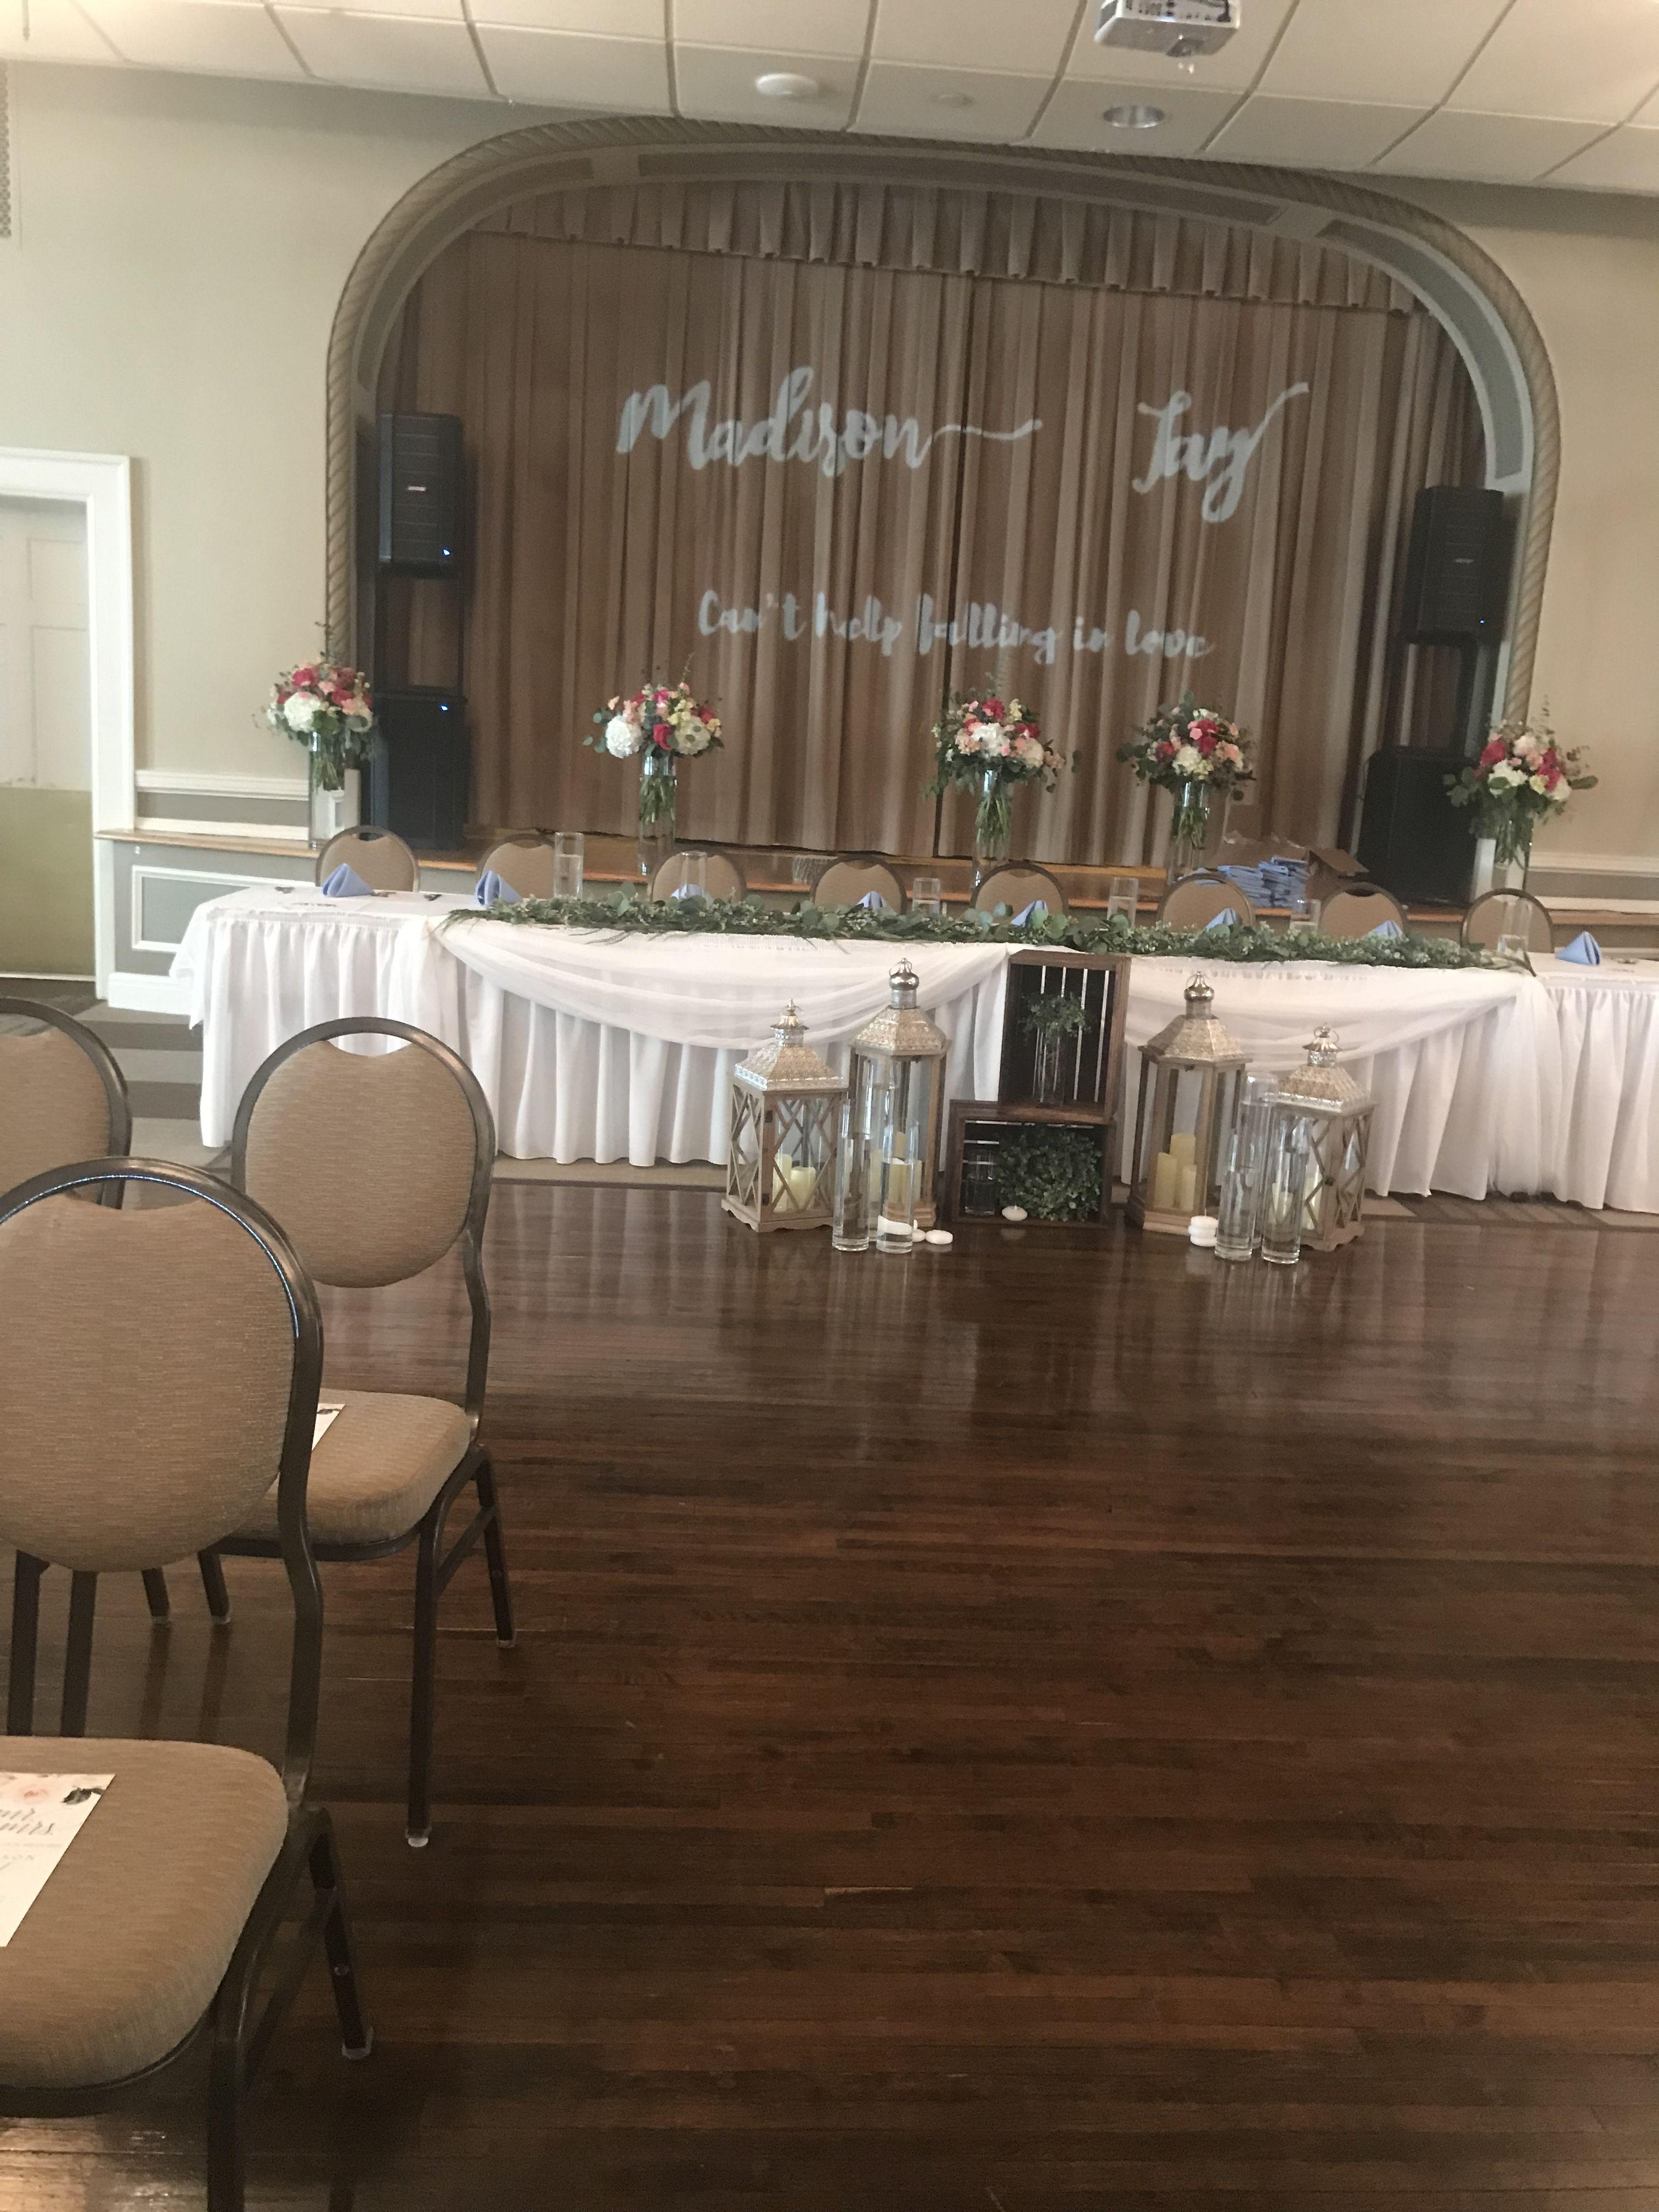 Iowa Wedding Venue From Cvdjs Iowa Wedding Venues Wedding Dj Dj Events